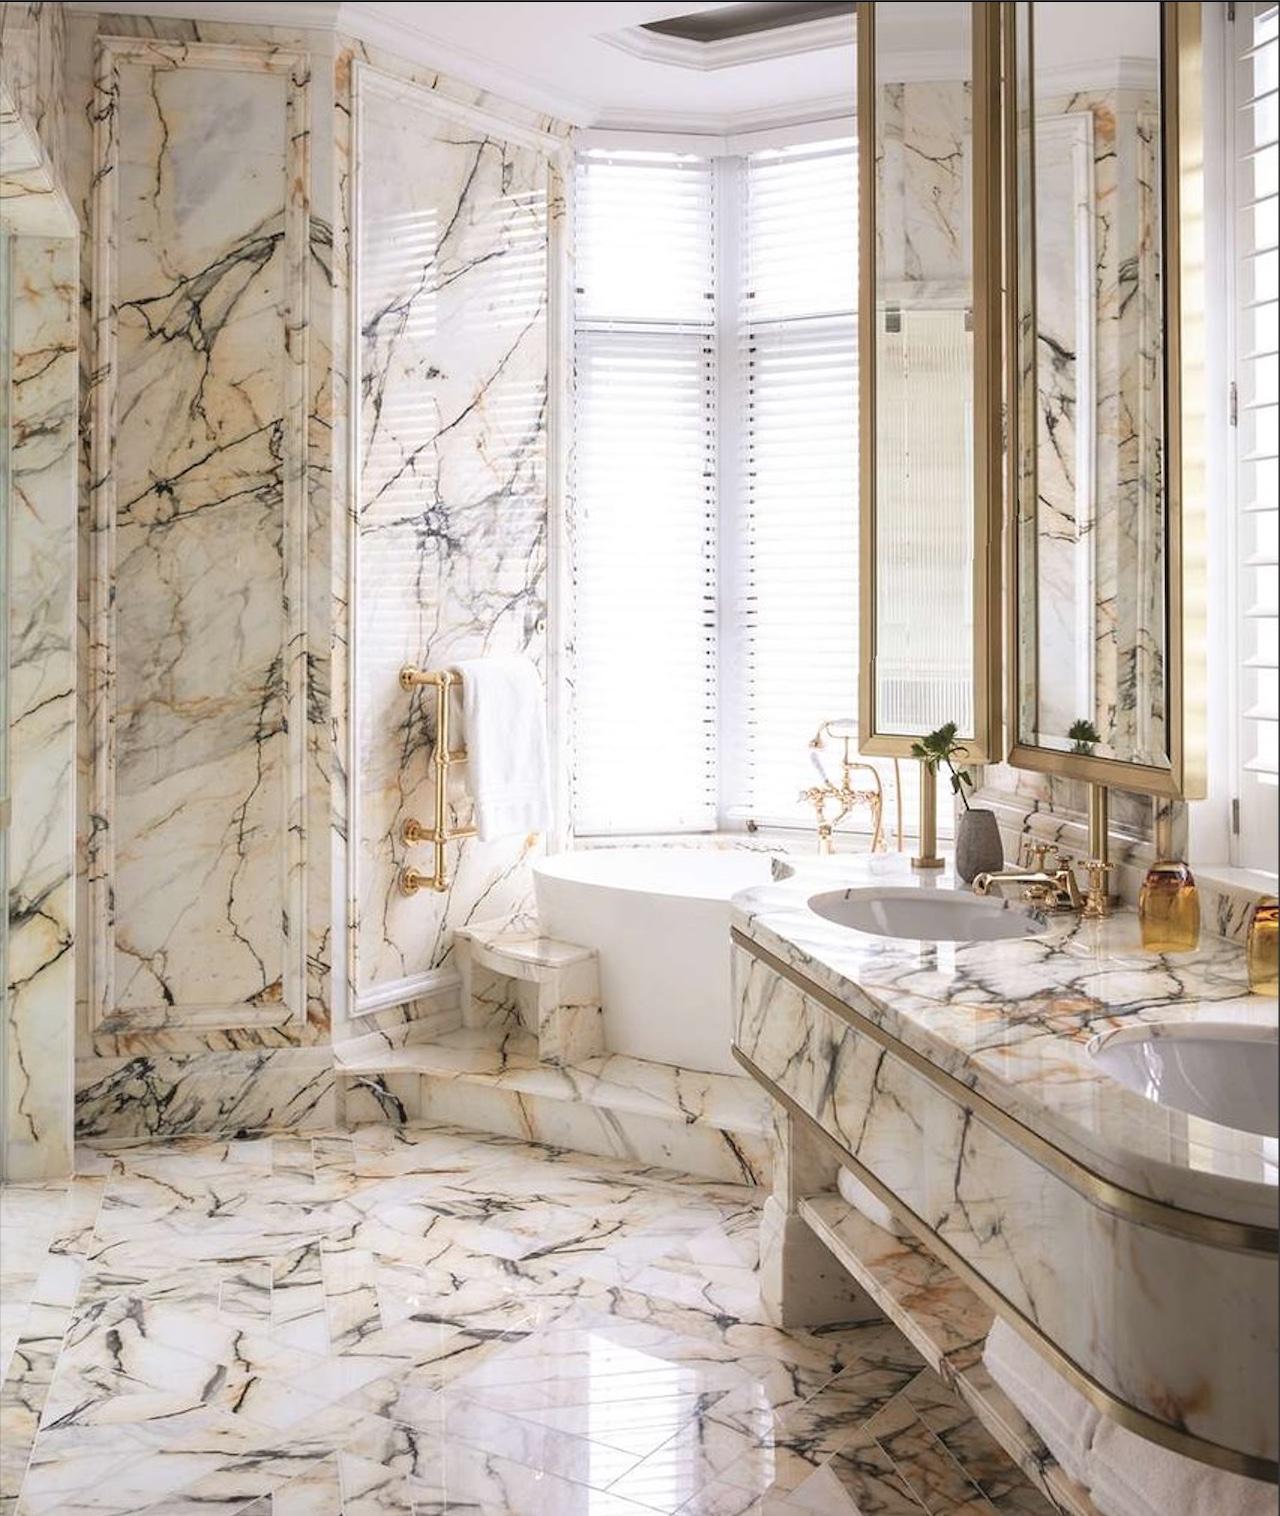 Bathroom hotel Paonazzo